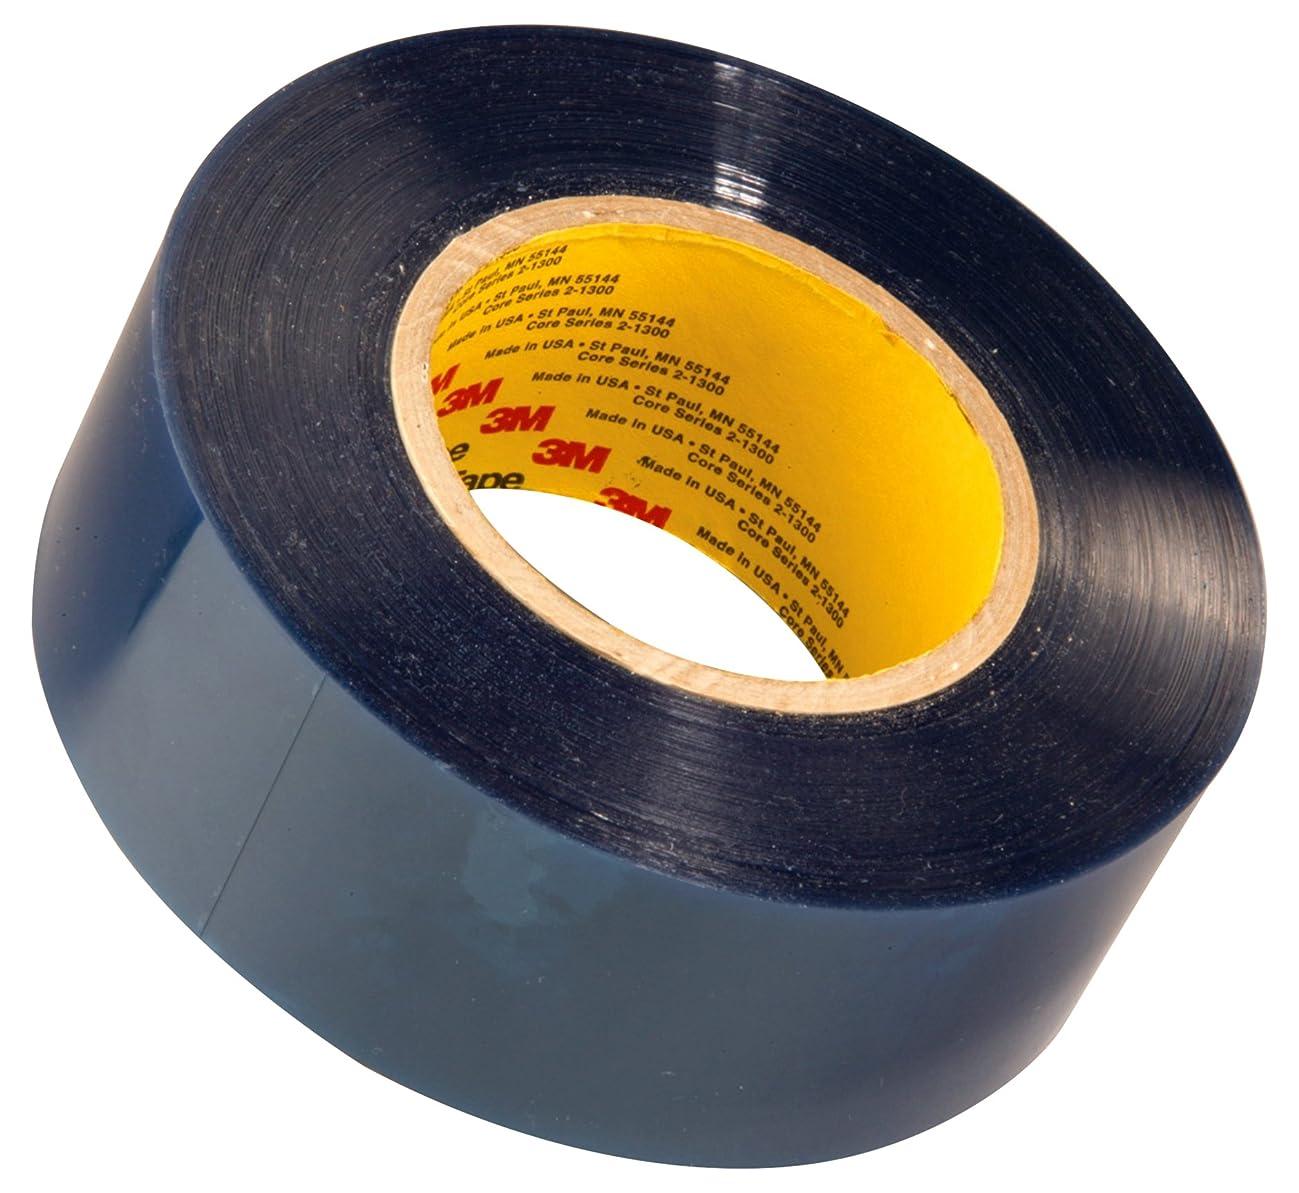 3M 98112 Tape, 1/2